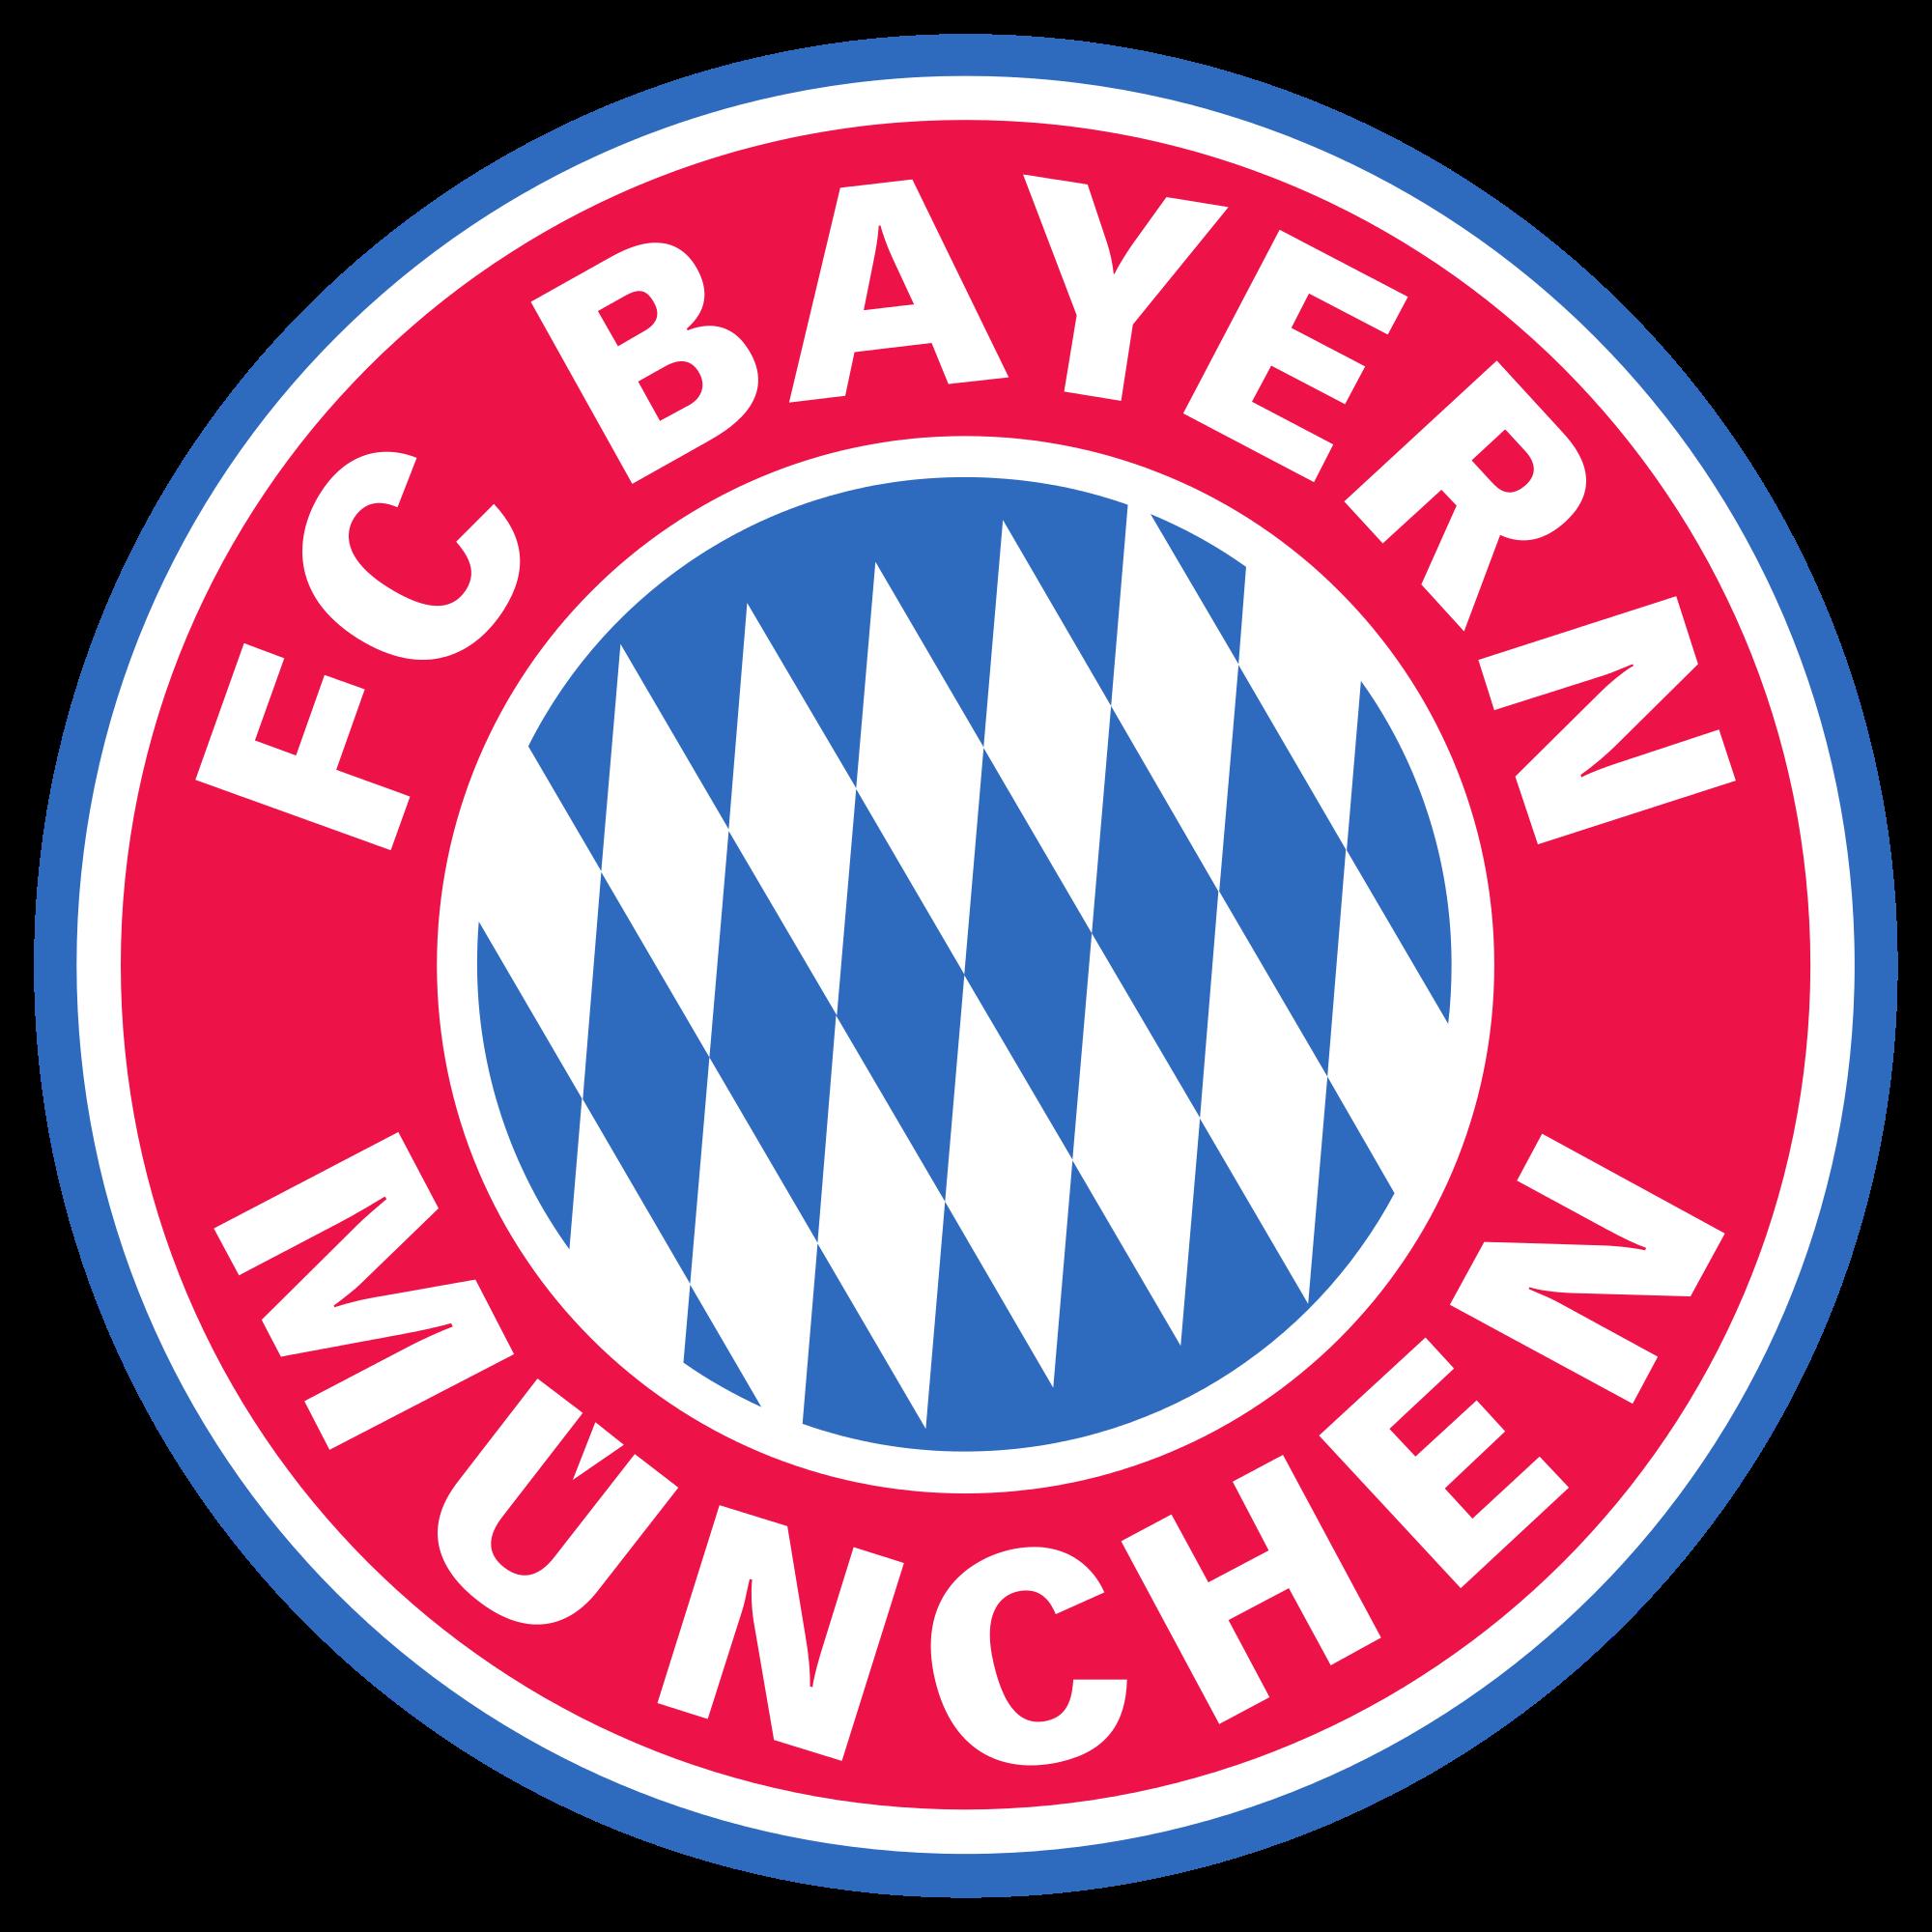 شعار بايرن ميونخ